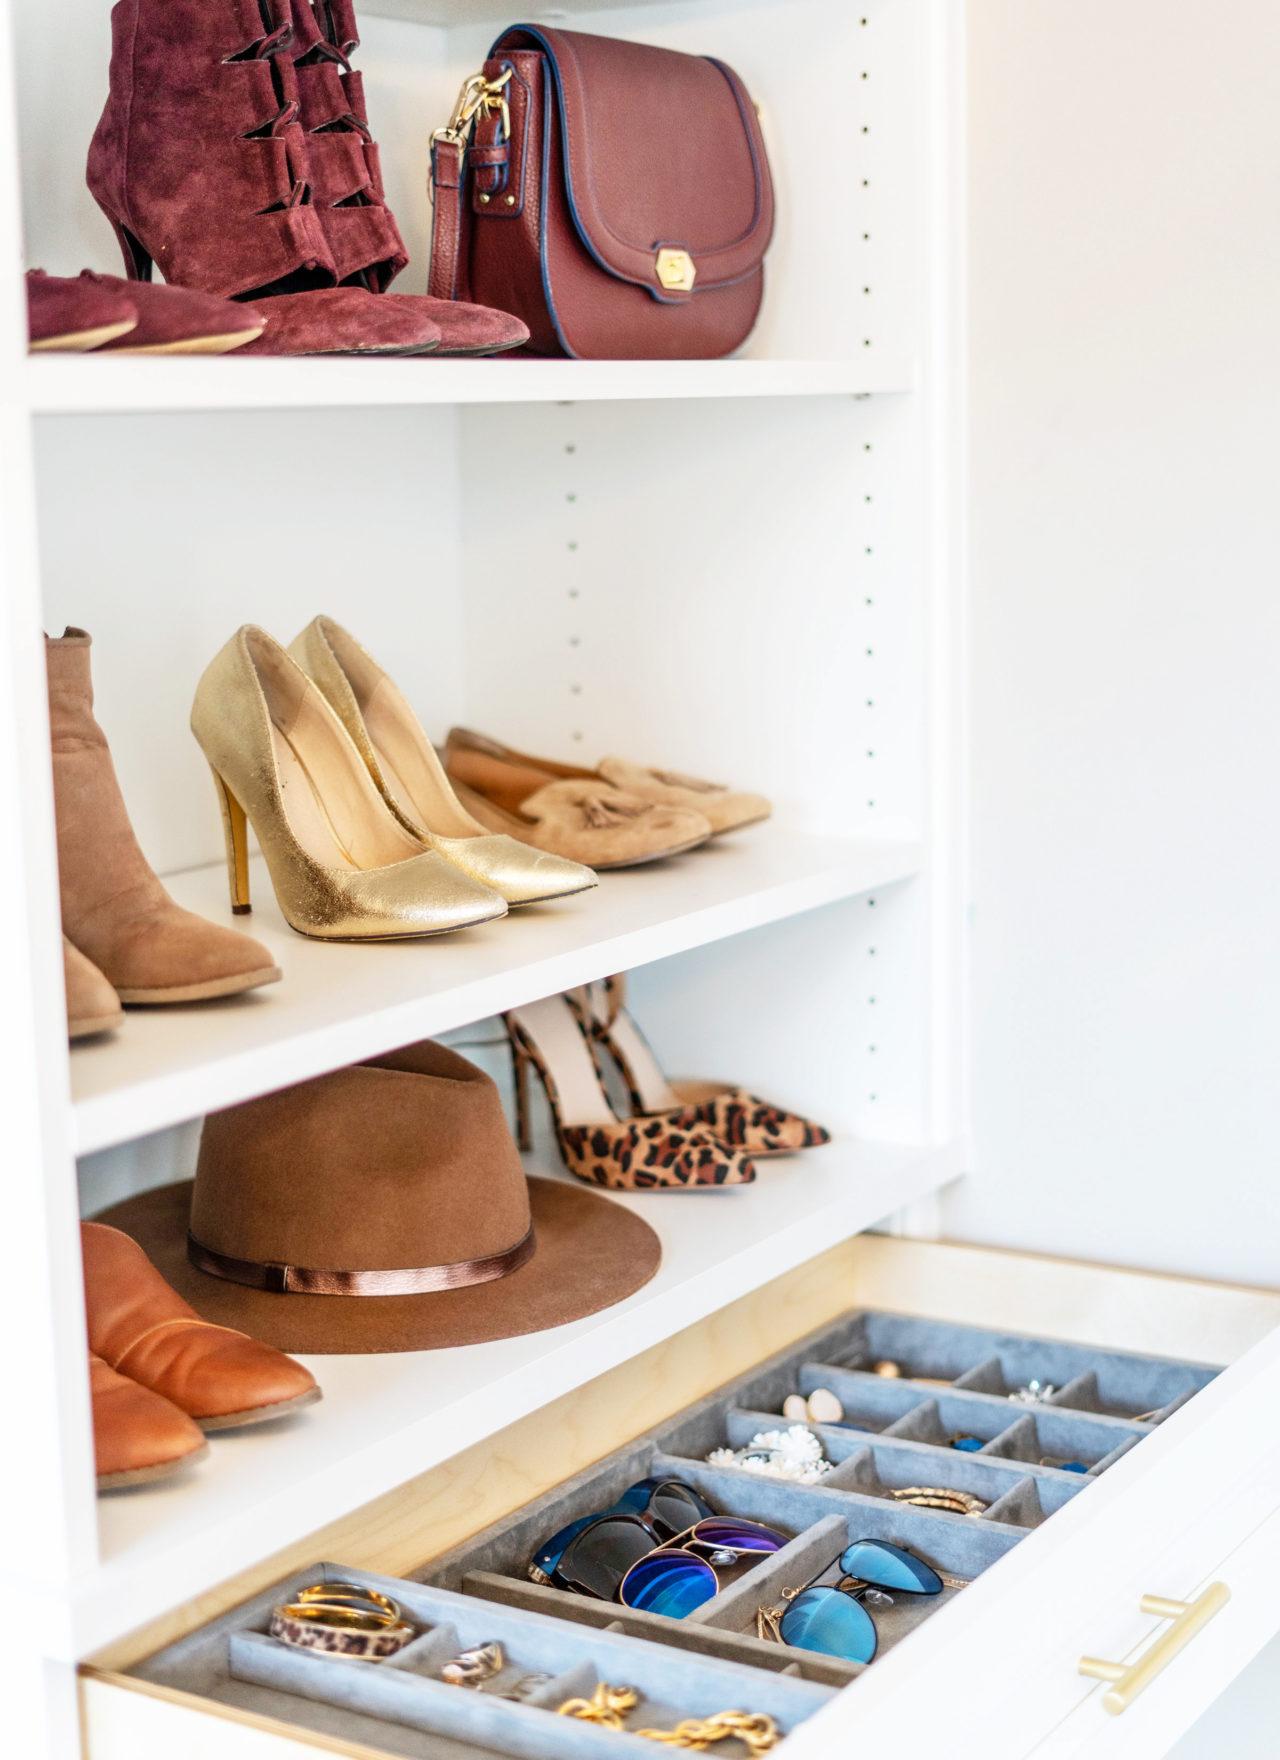 Shoe earring and bag organization